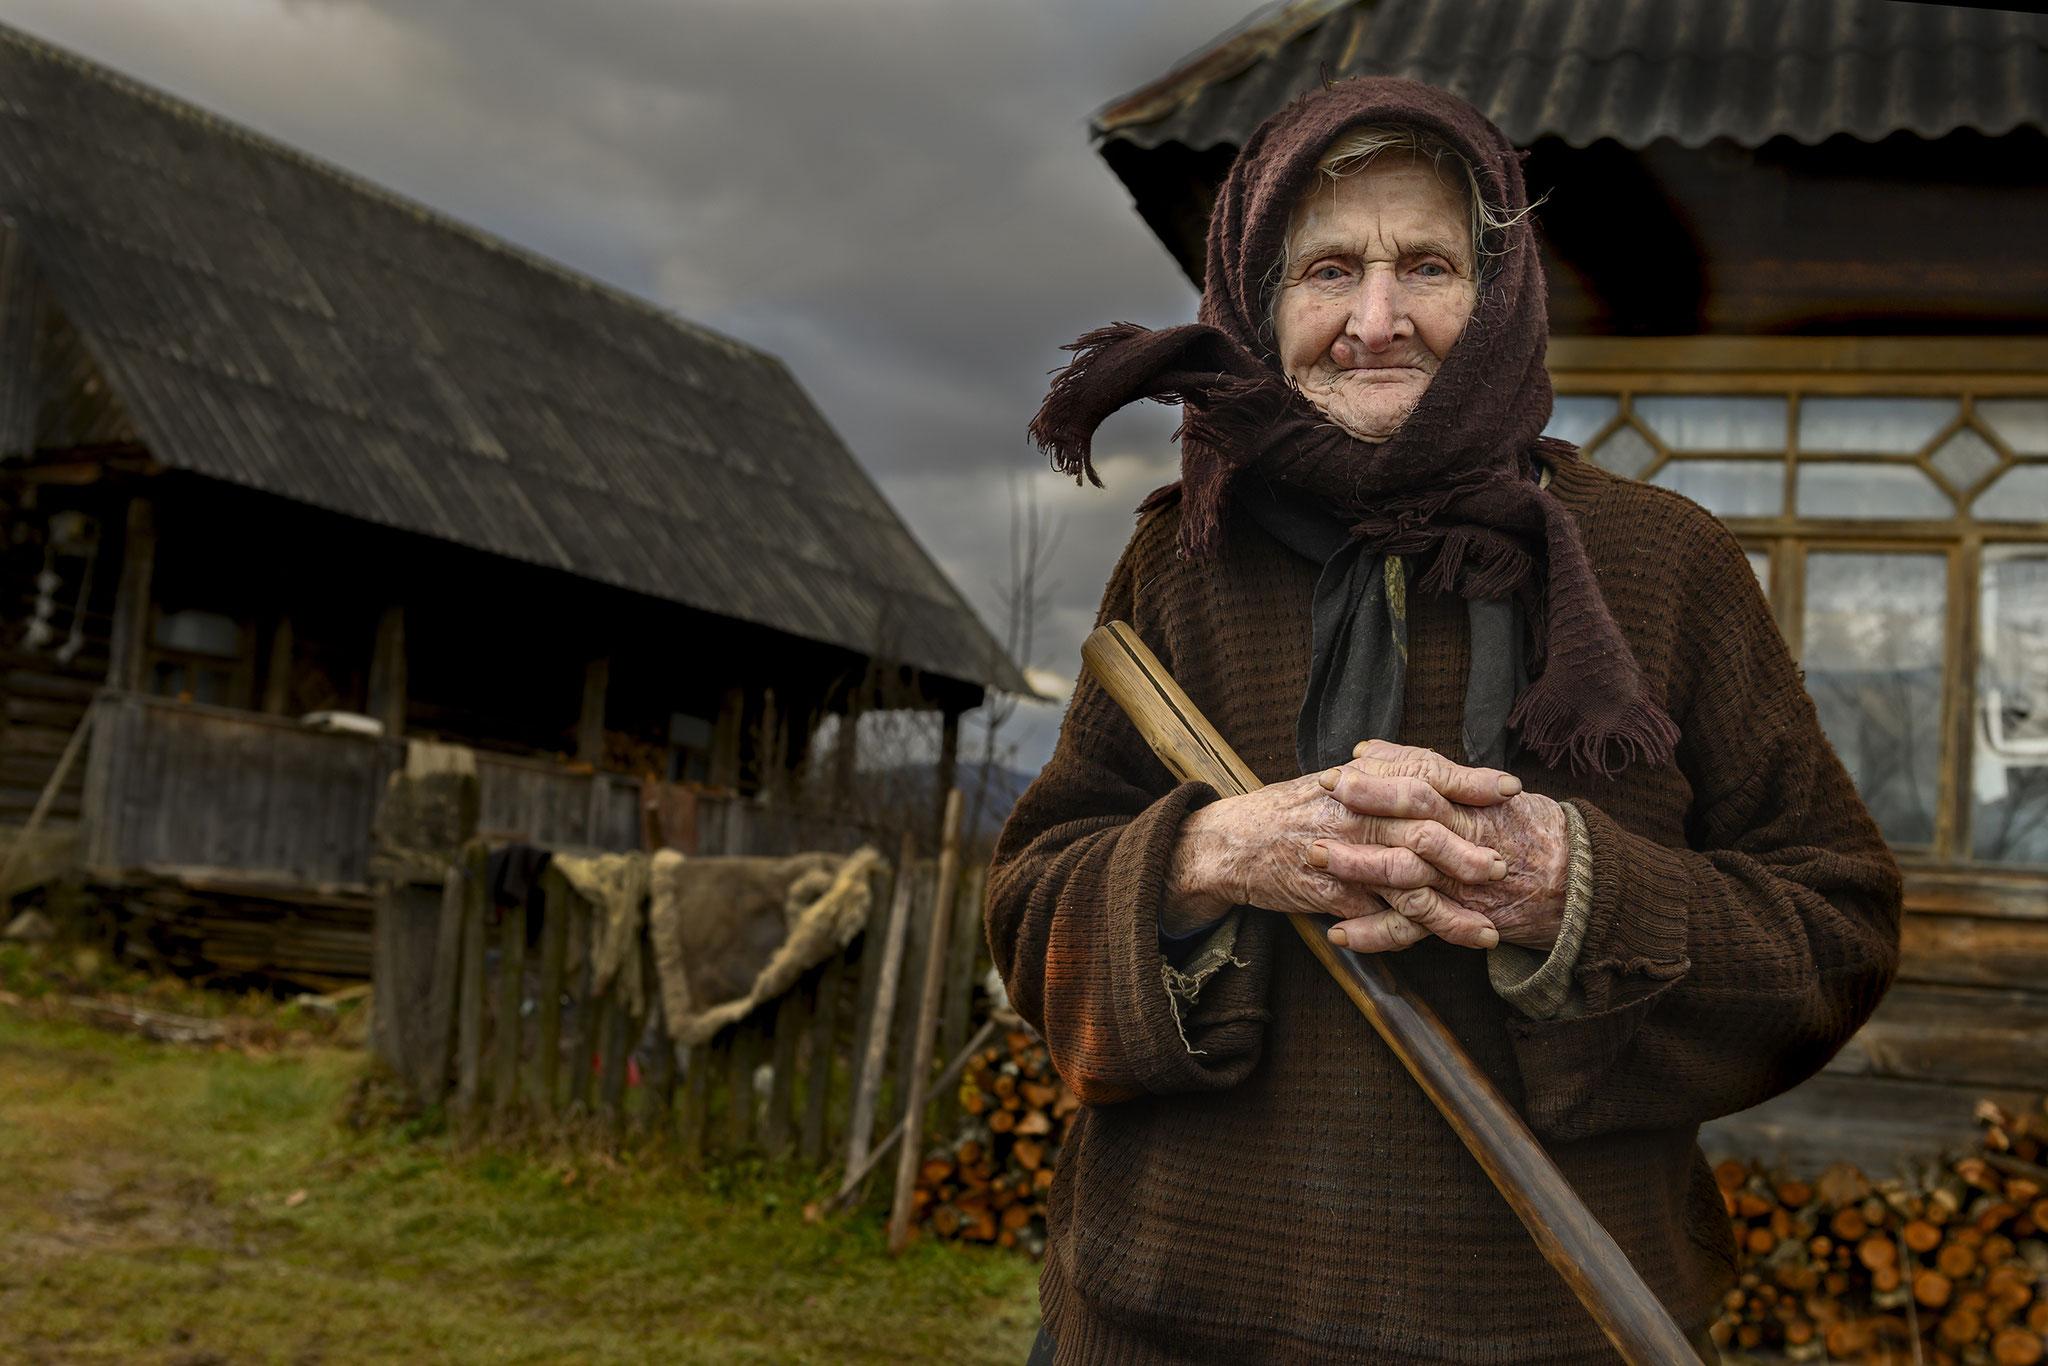 Mariana Scubli (Romania) - Acceptance